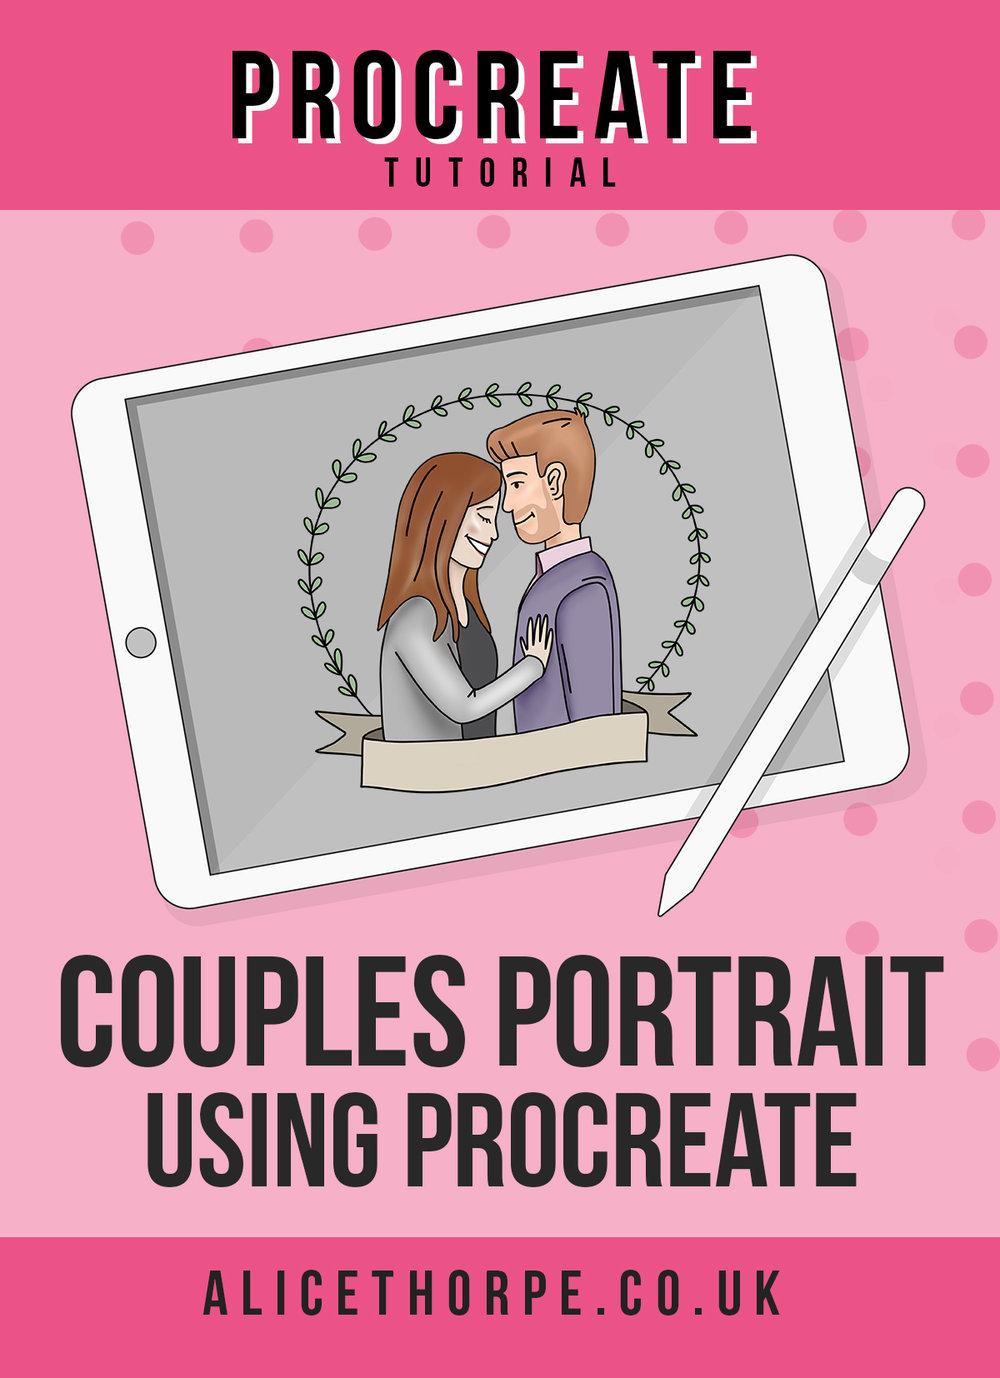 Free Procreate tutorial to create cartoon couples portrait by Alice Thorpe